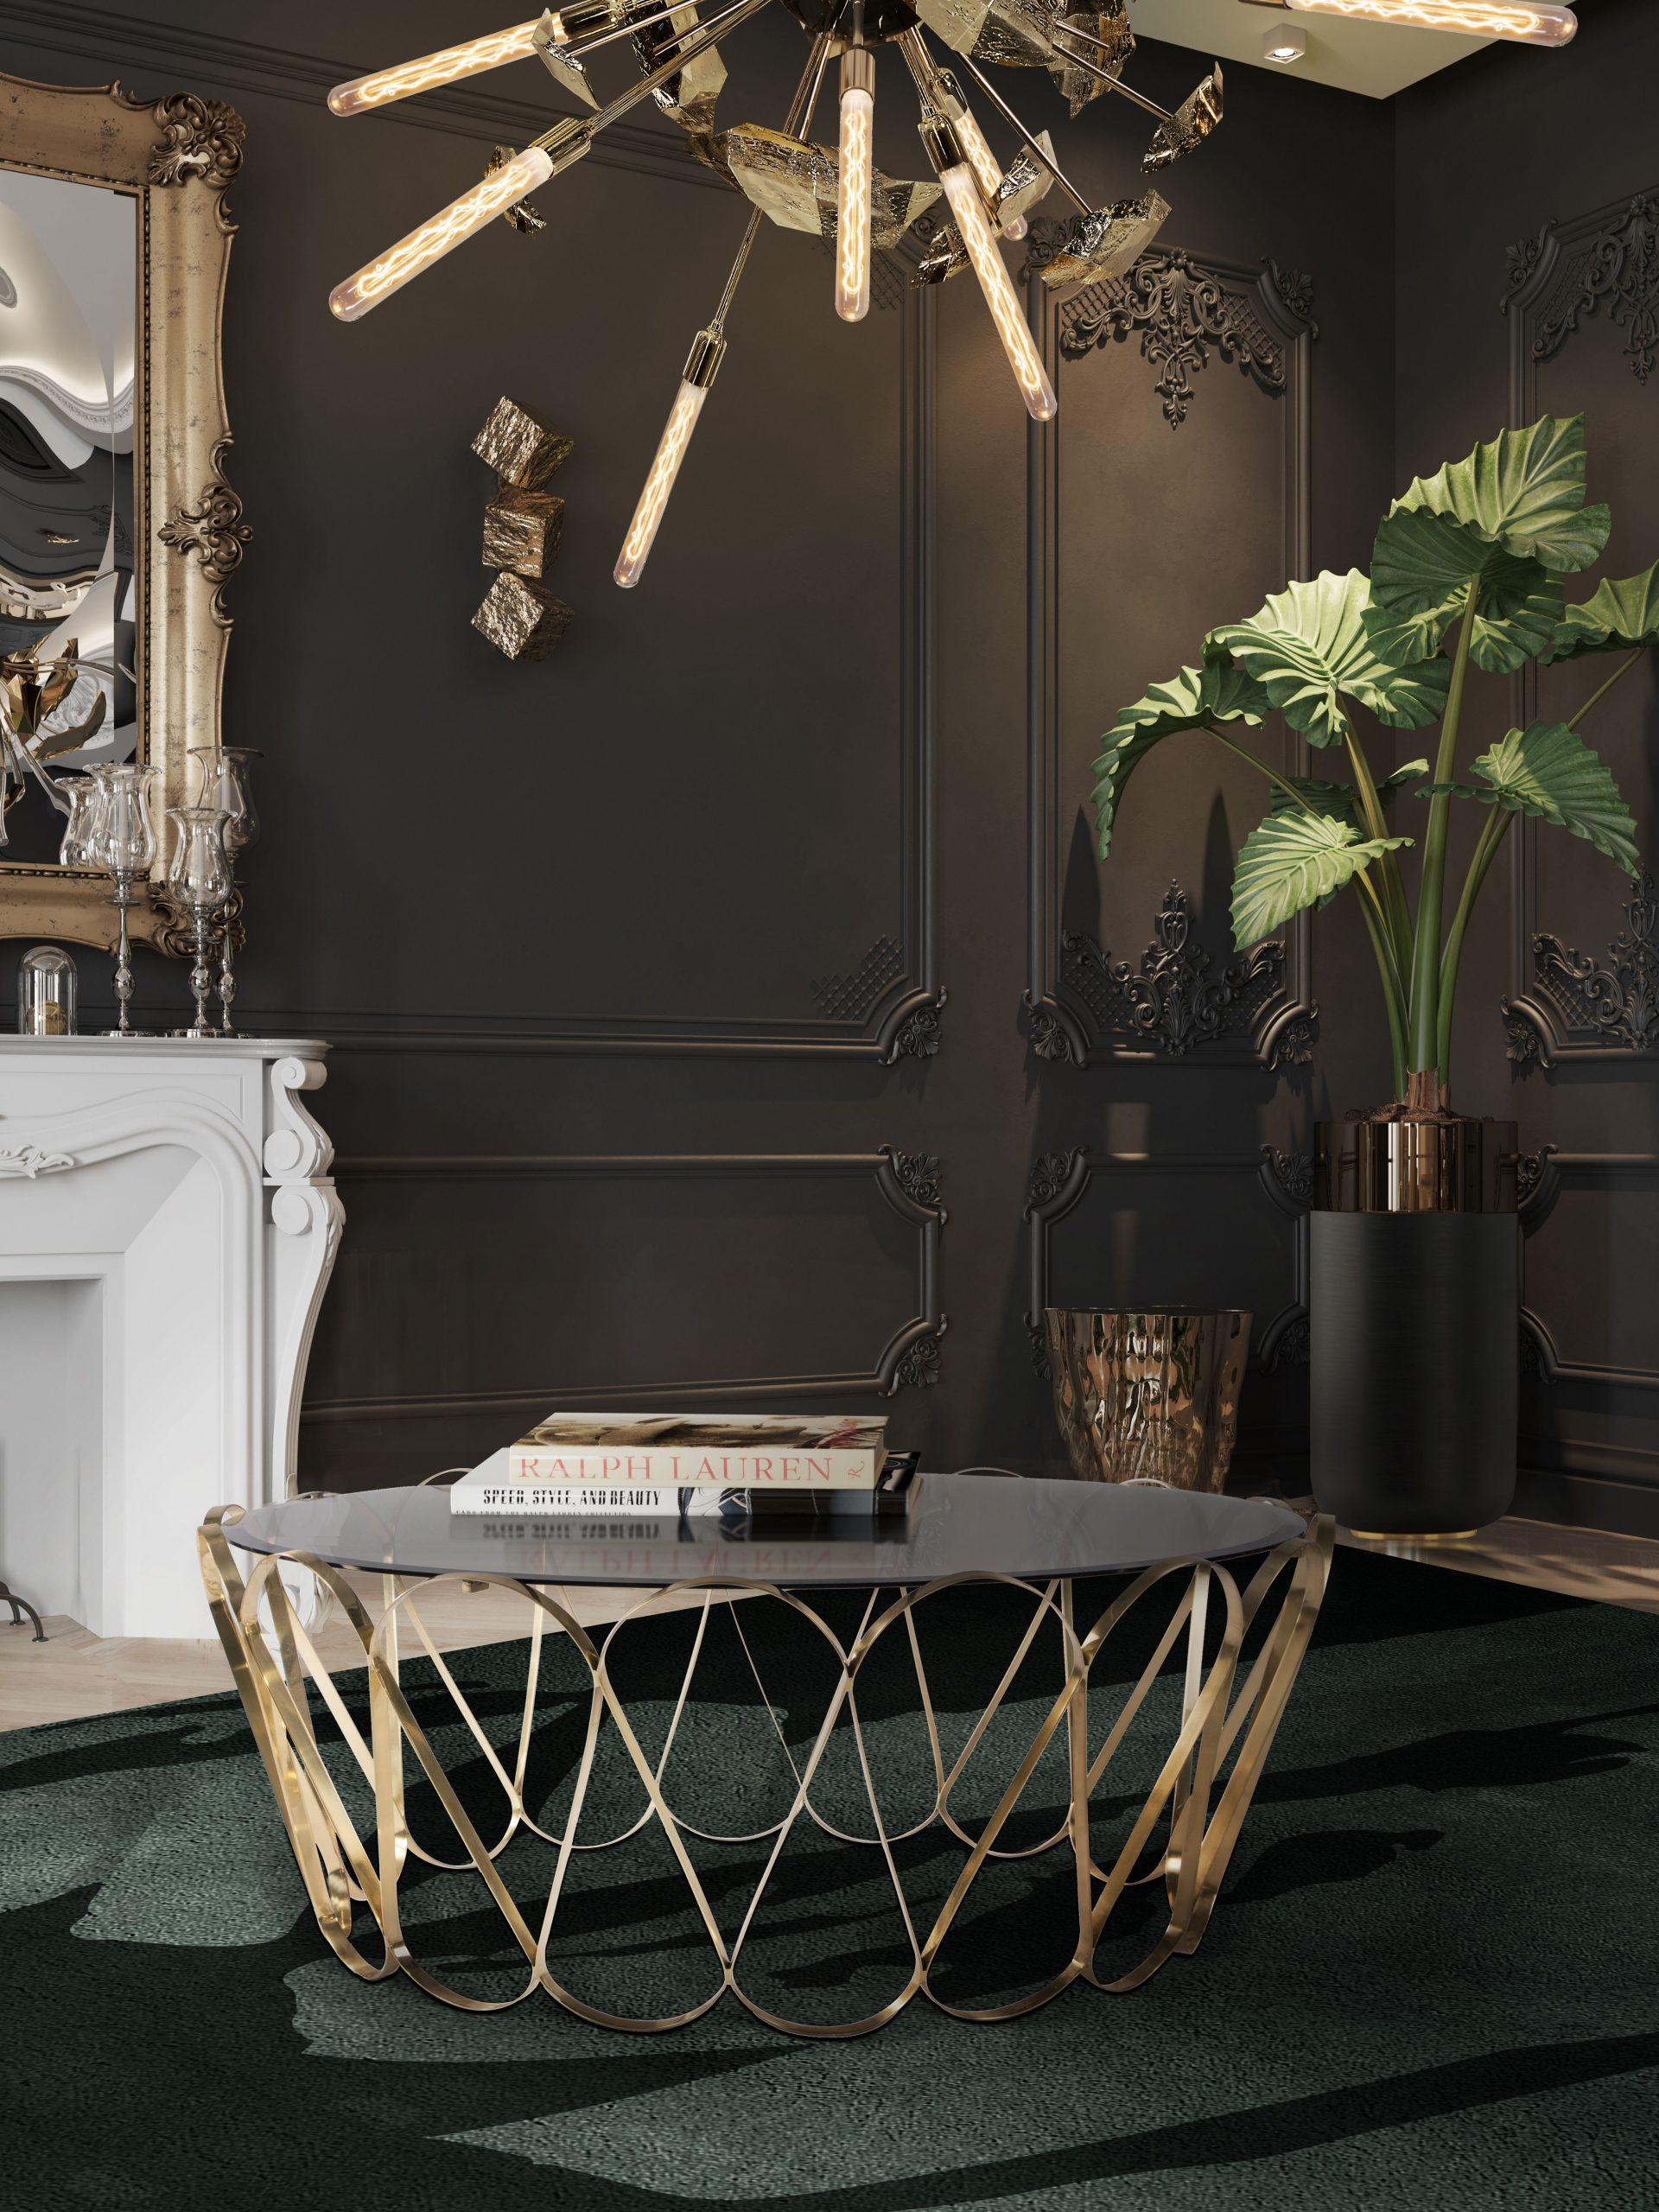 Rug's Inspirations For a Fantastic Home Interior Design